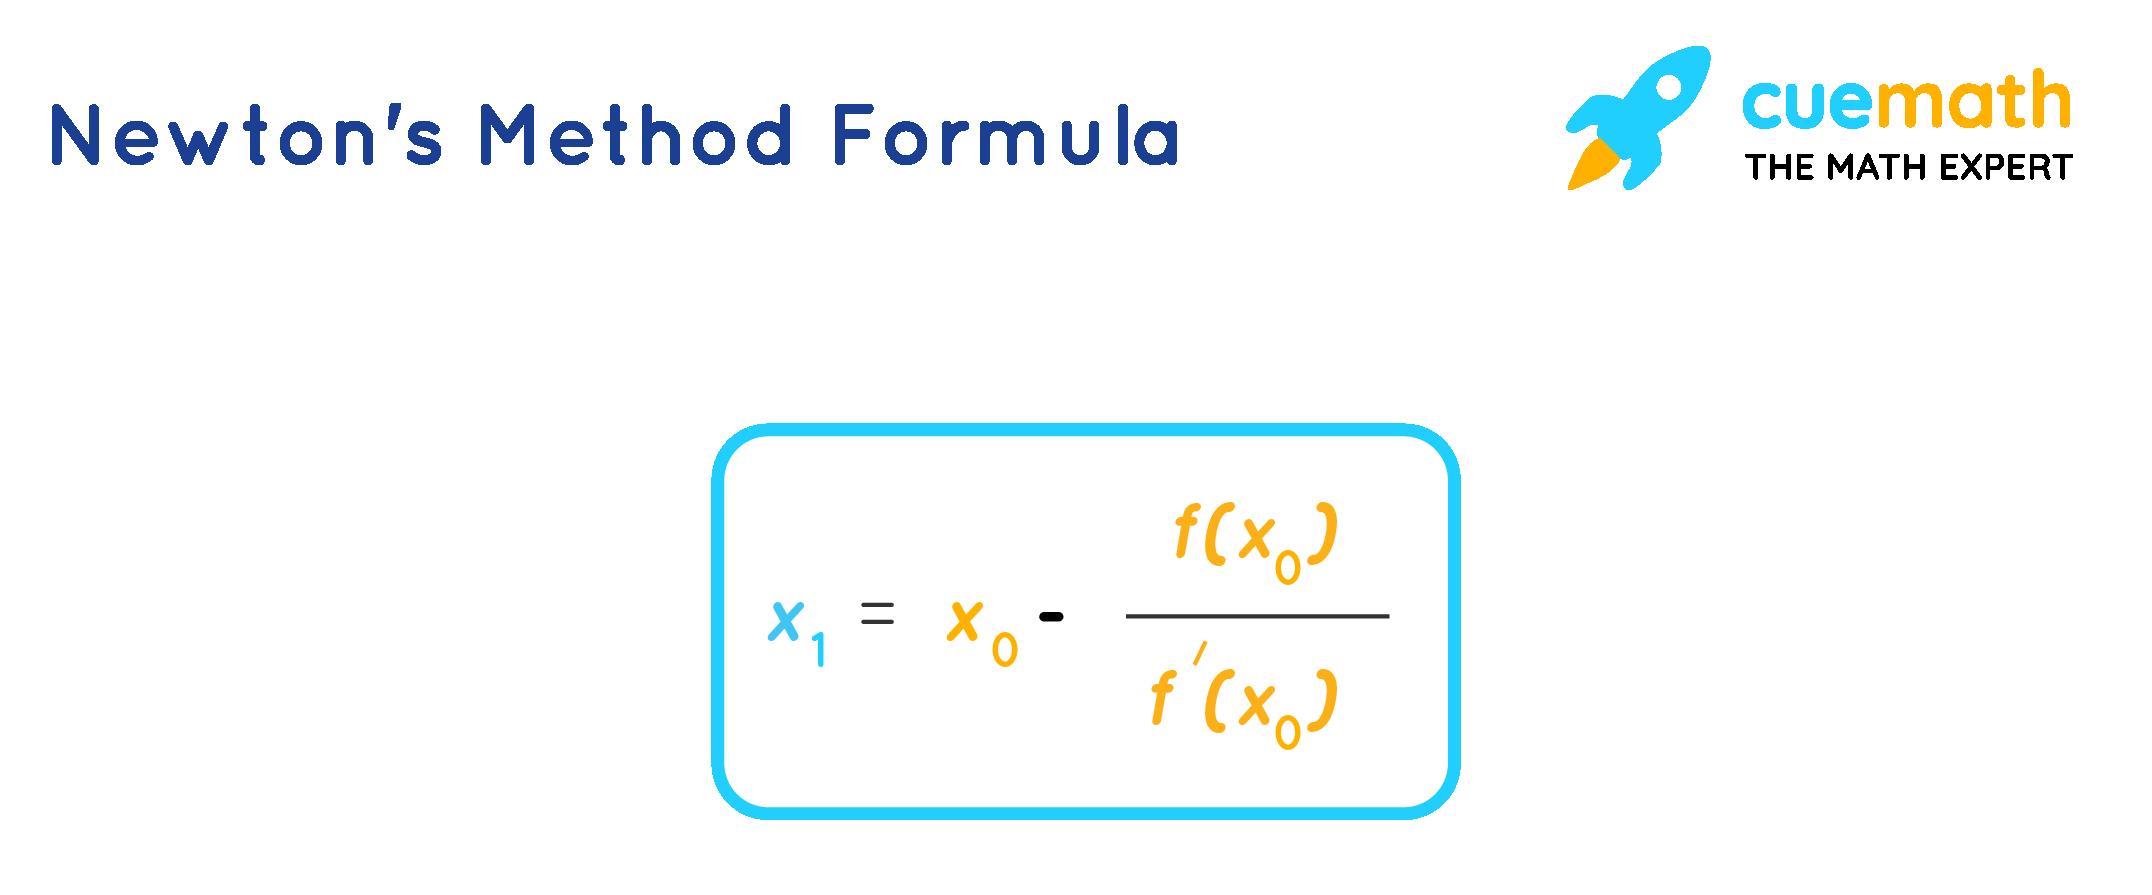 Newton's method formula